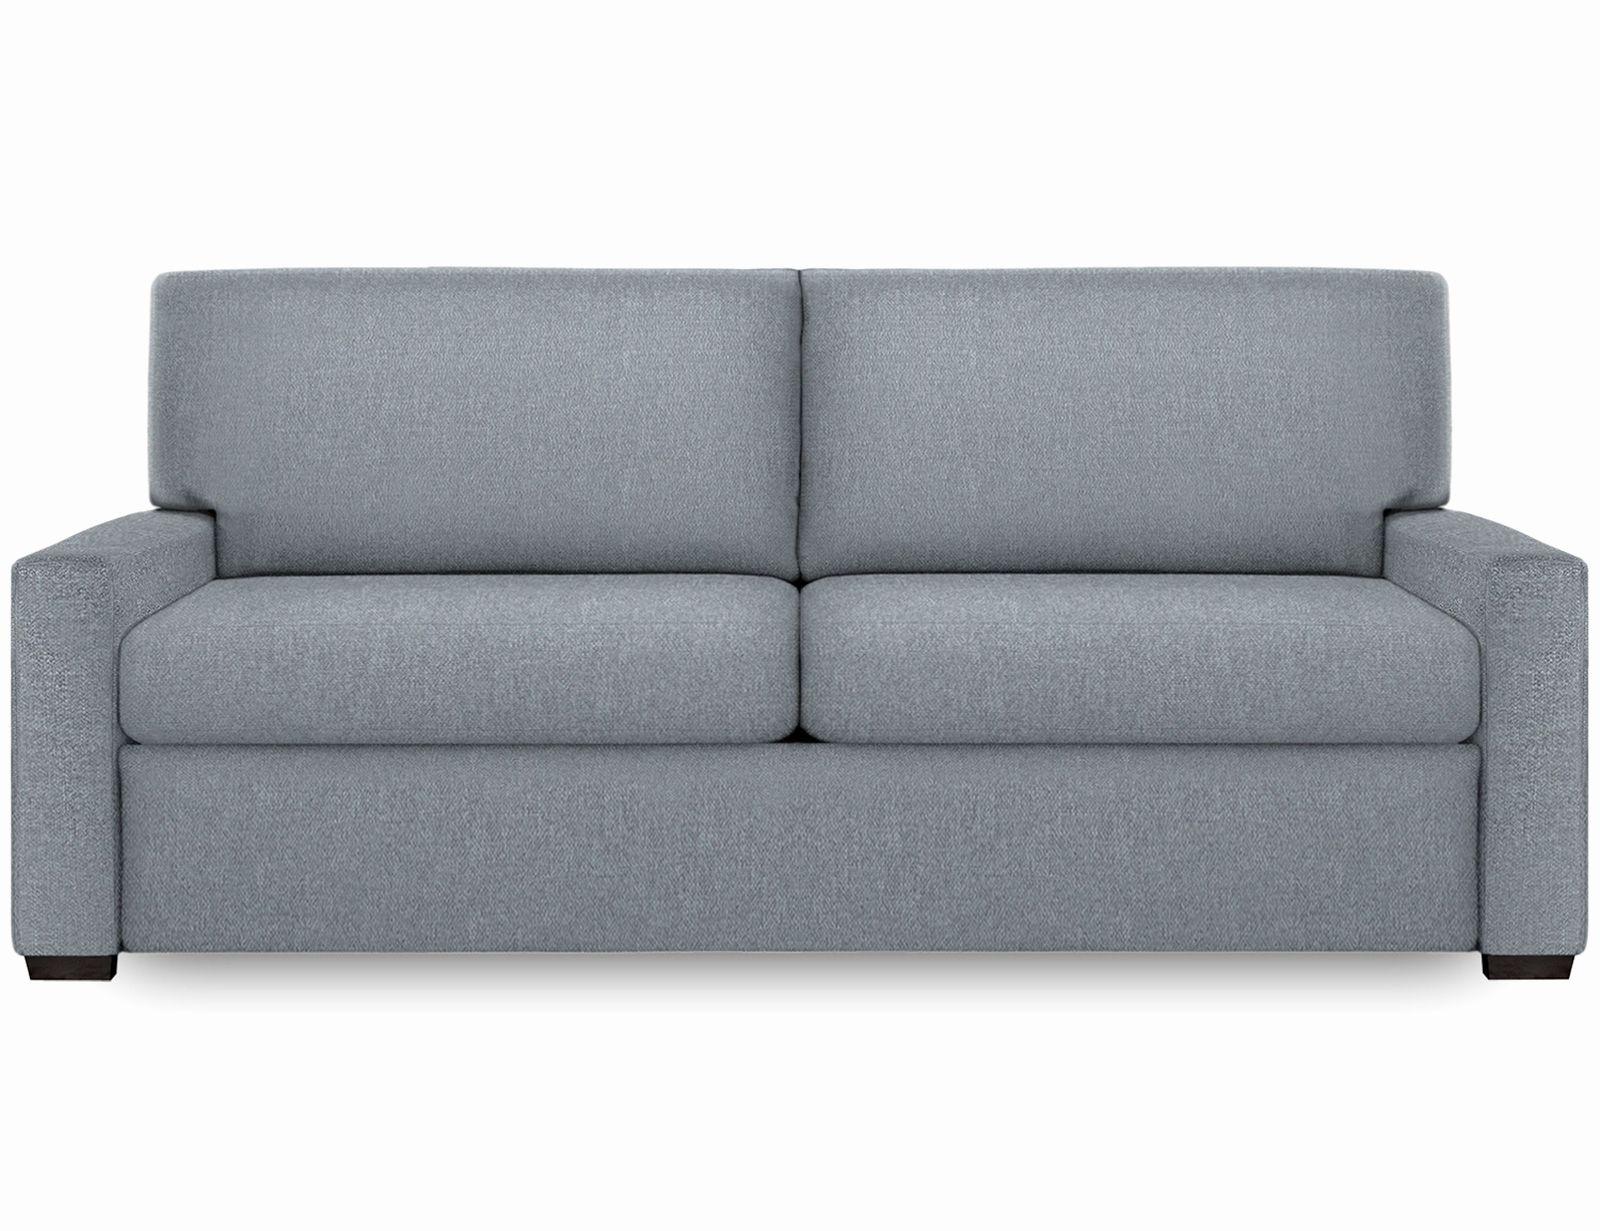 best apartment sofa bed amazon futon therapy sleeper design 540327